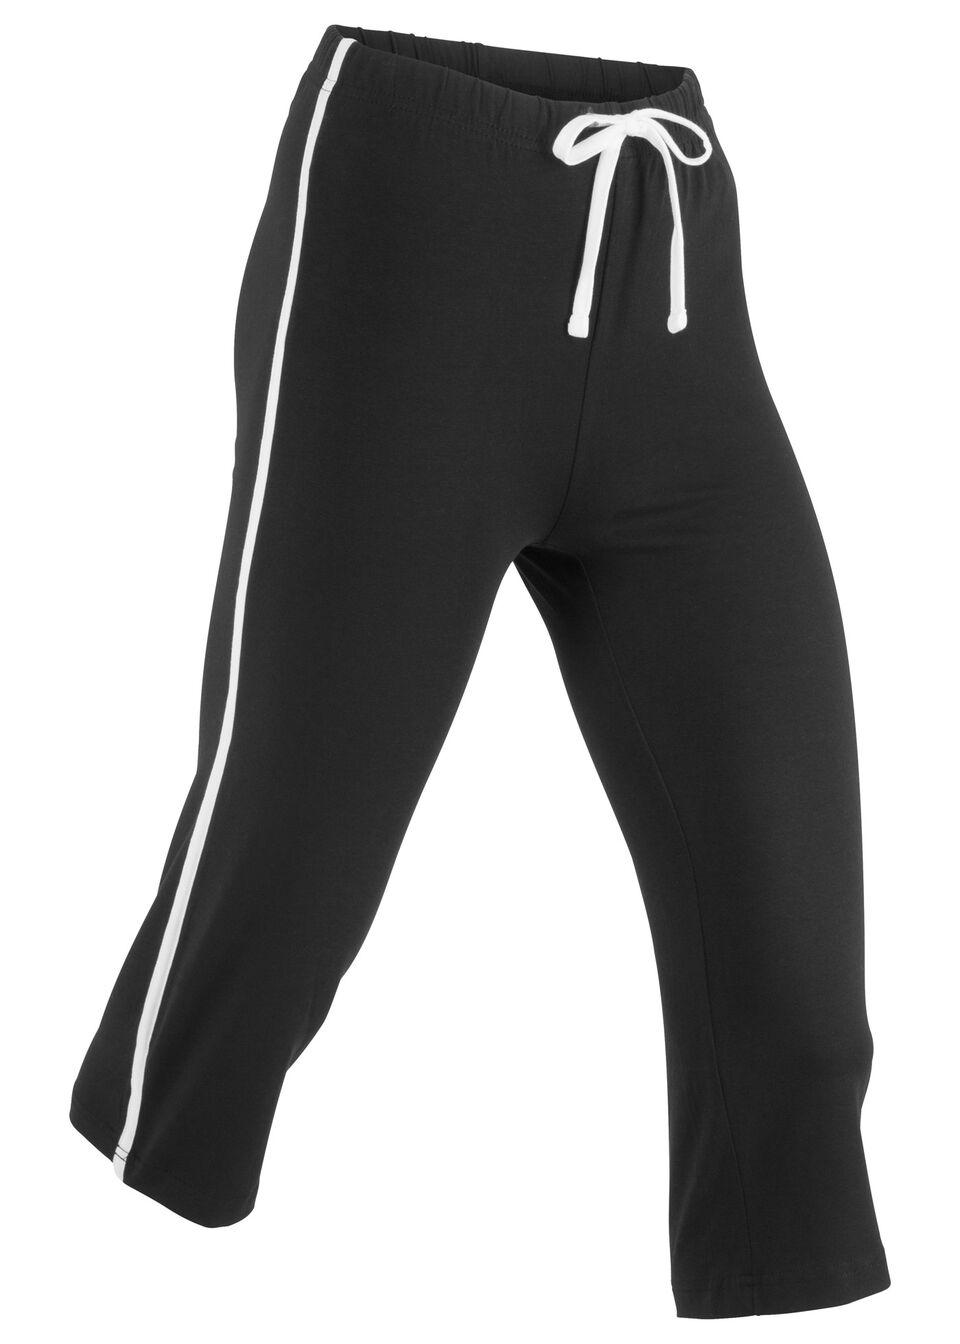 Спортивные брюки-капри 3/4 от bonprix